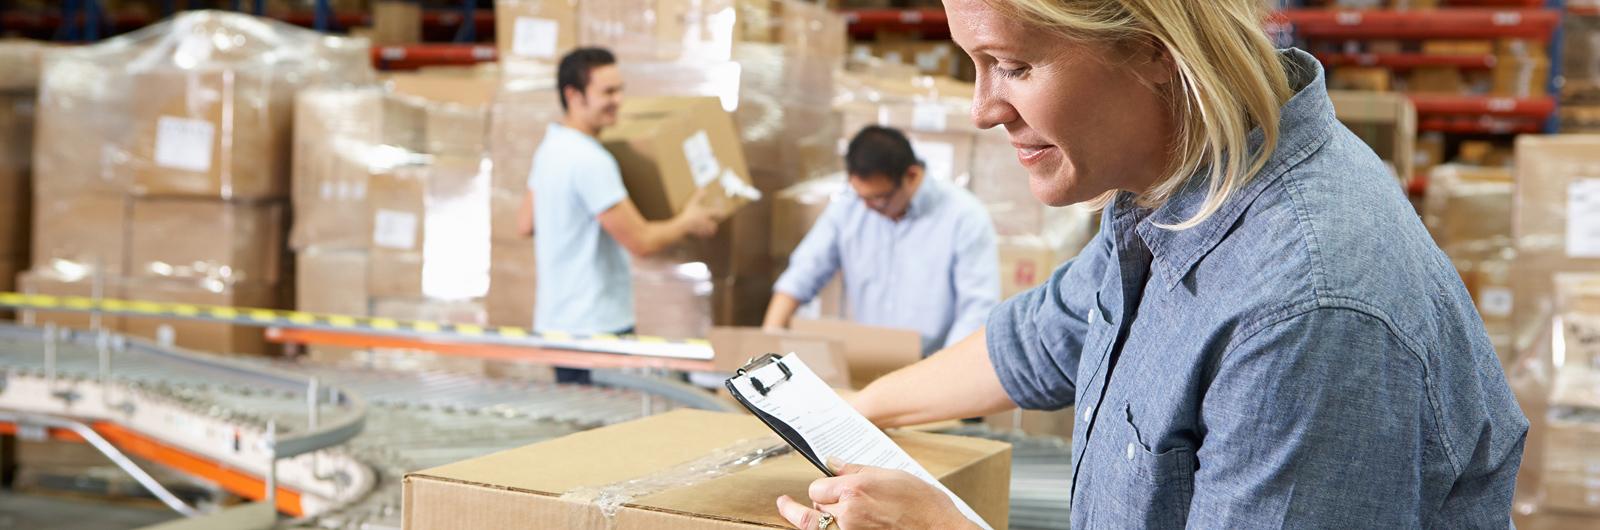 VMI - Vendor Managed Inventory